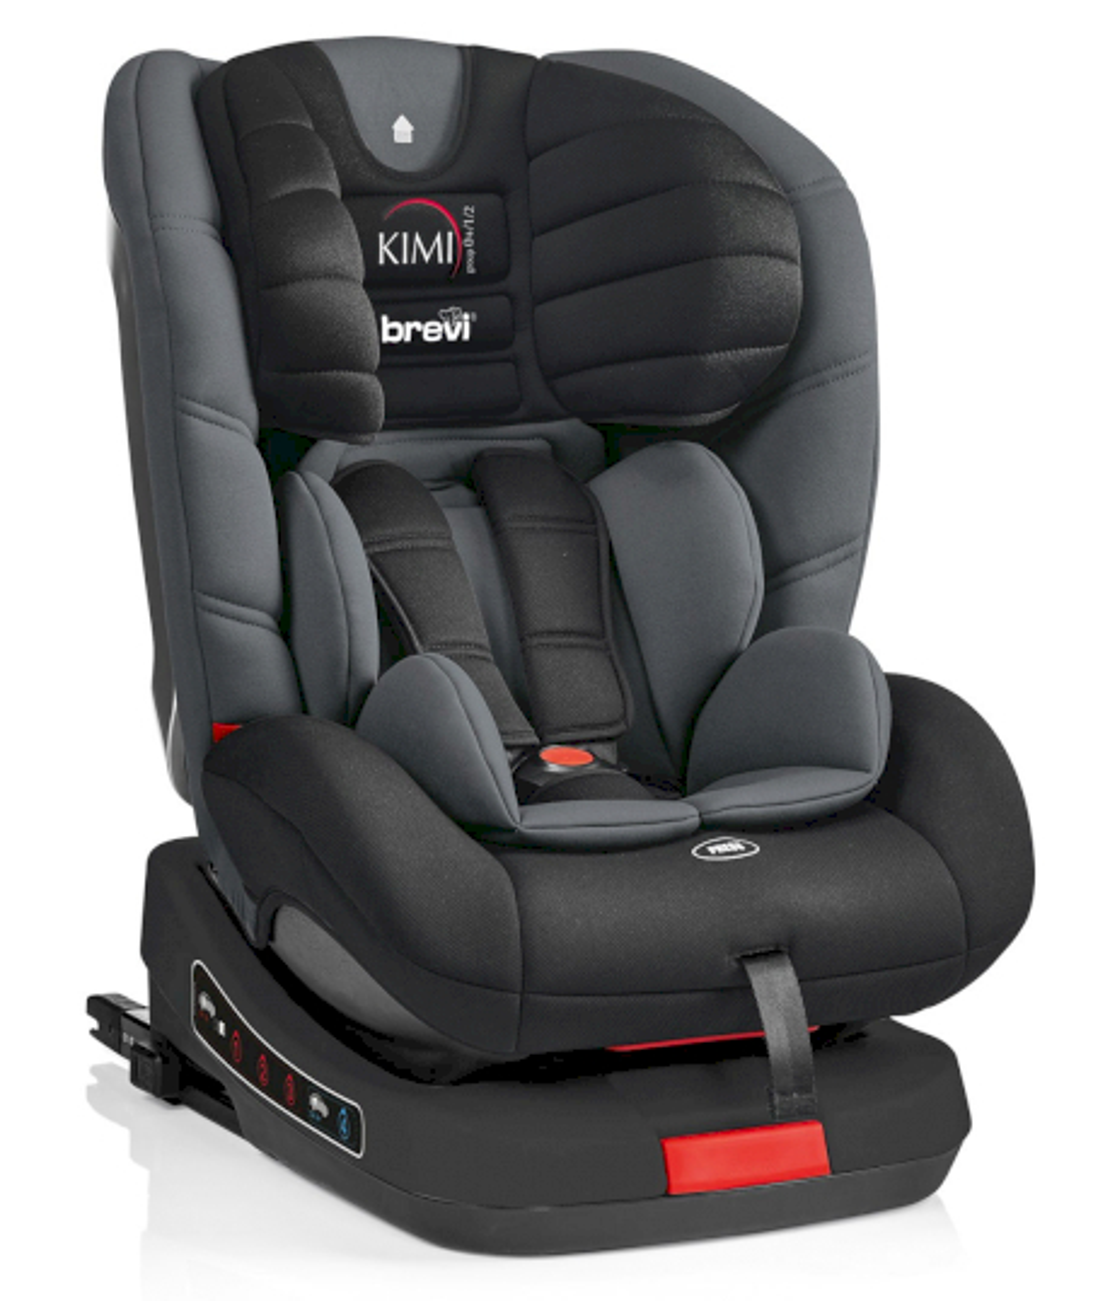 Siège-Auto Kimi Isofix Brevi Noir